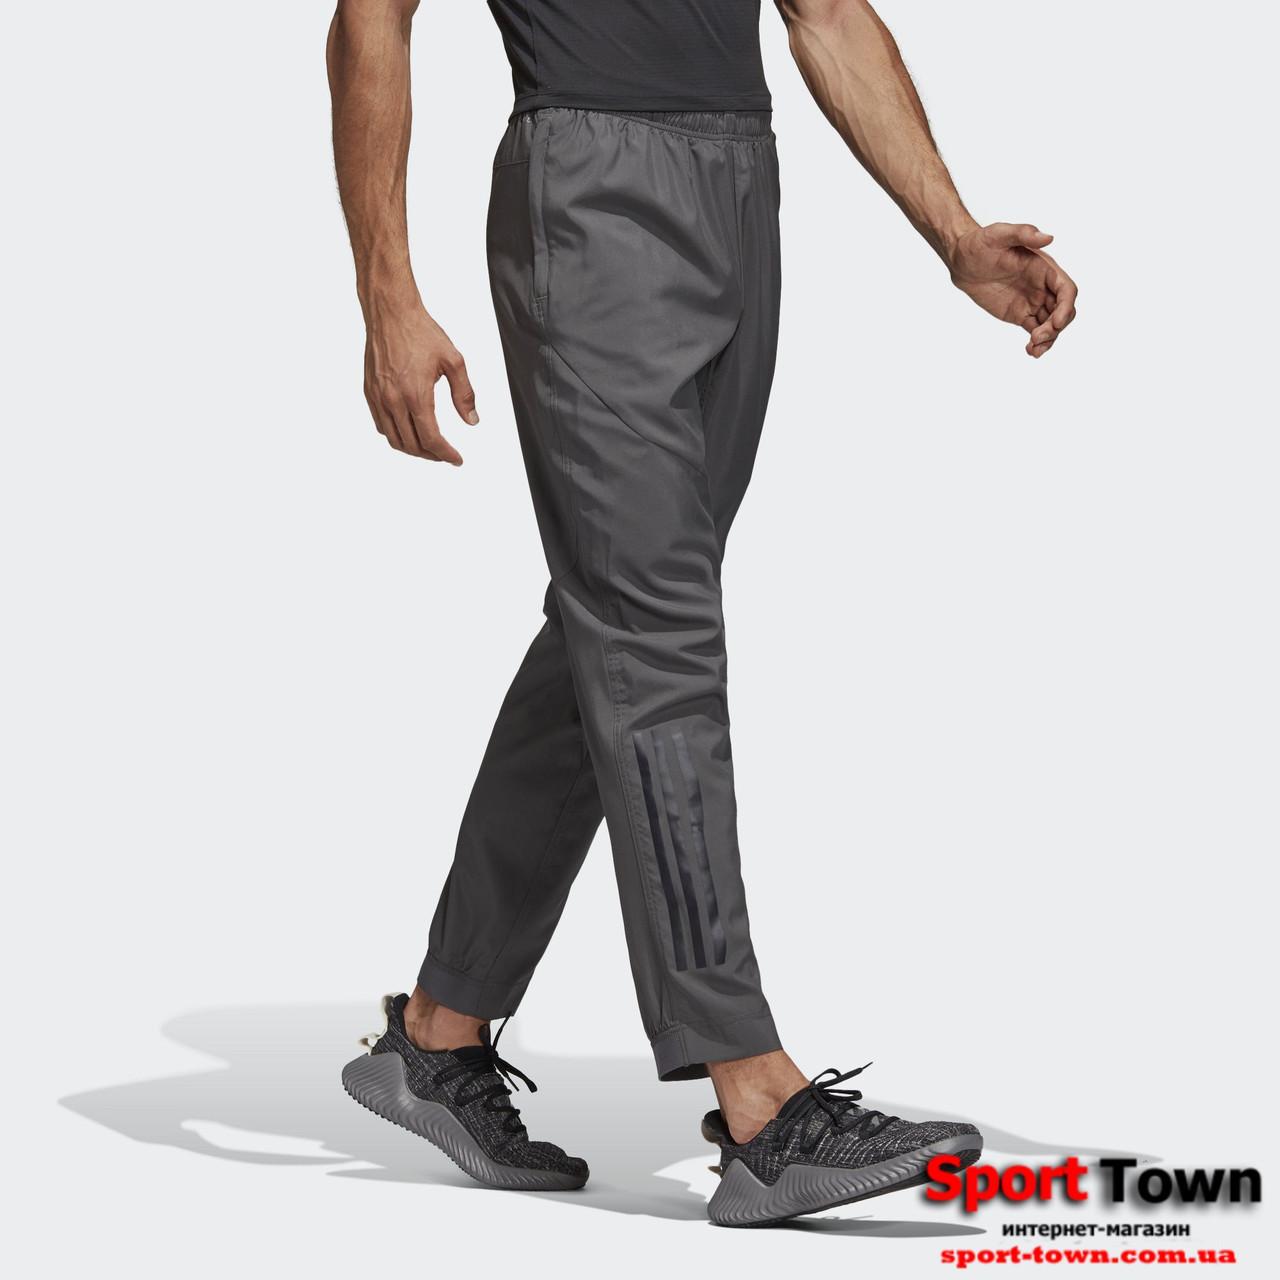 Adidas WO Pa Cool DW5382 Оригинал